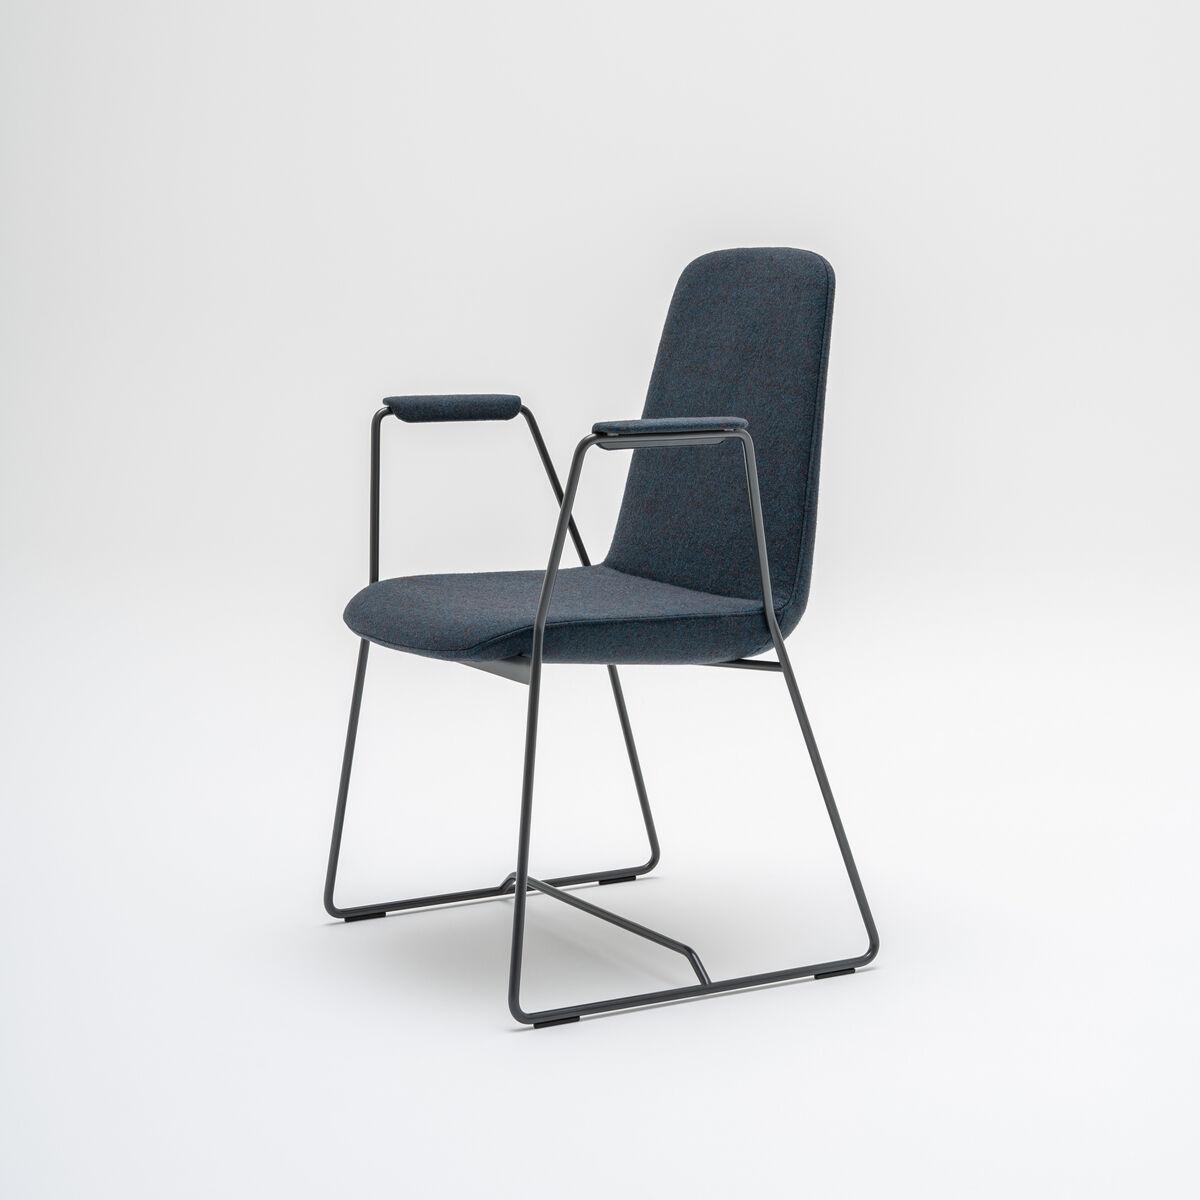 Chair Ulti Fabric: Atlantic Color: A60025  Base color:  M154